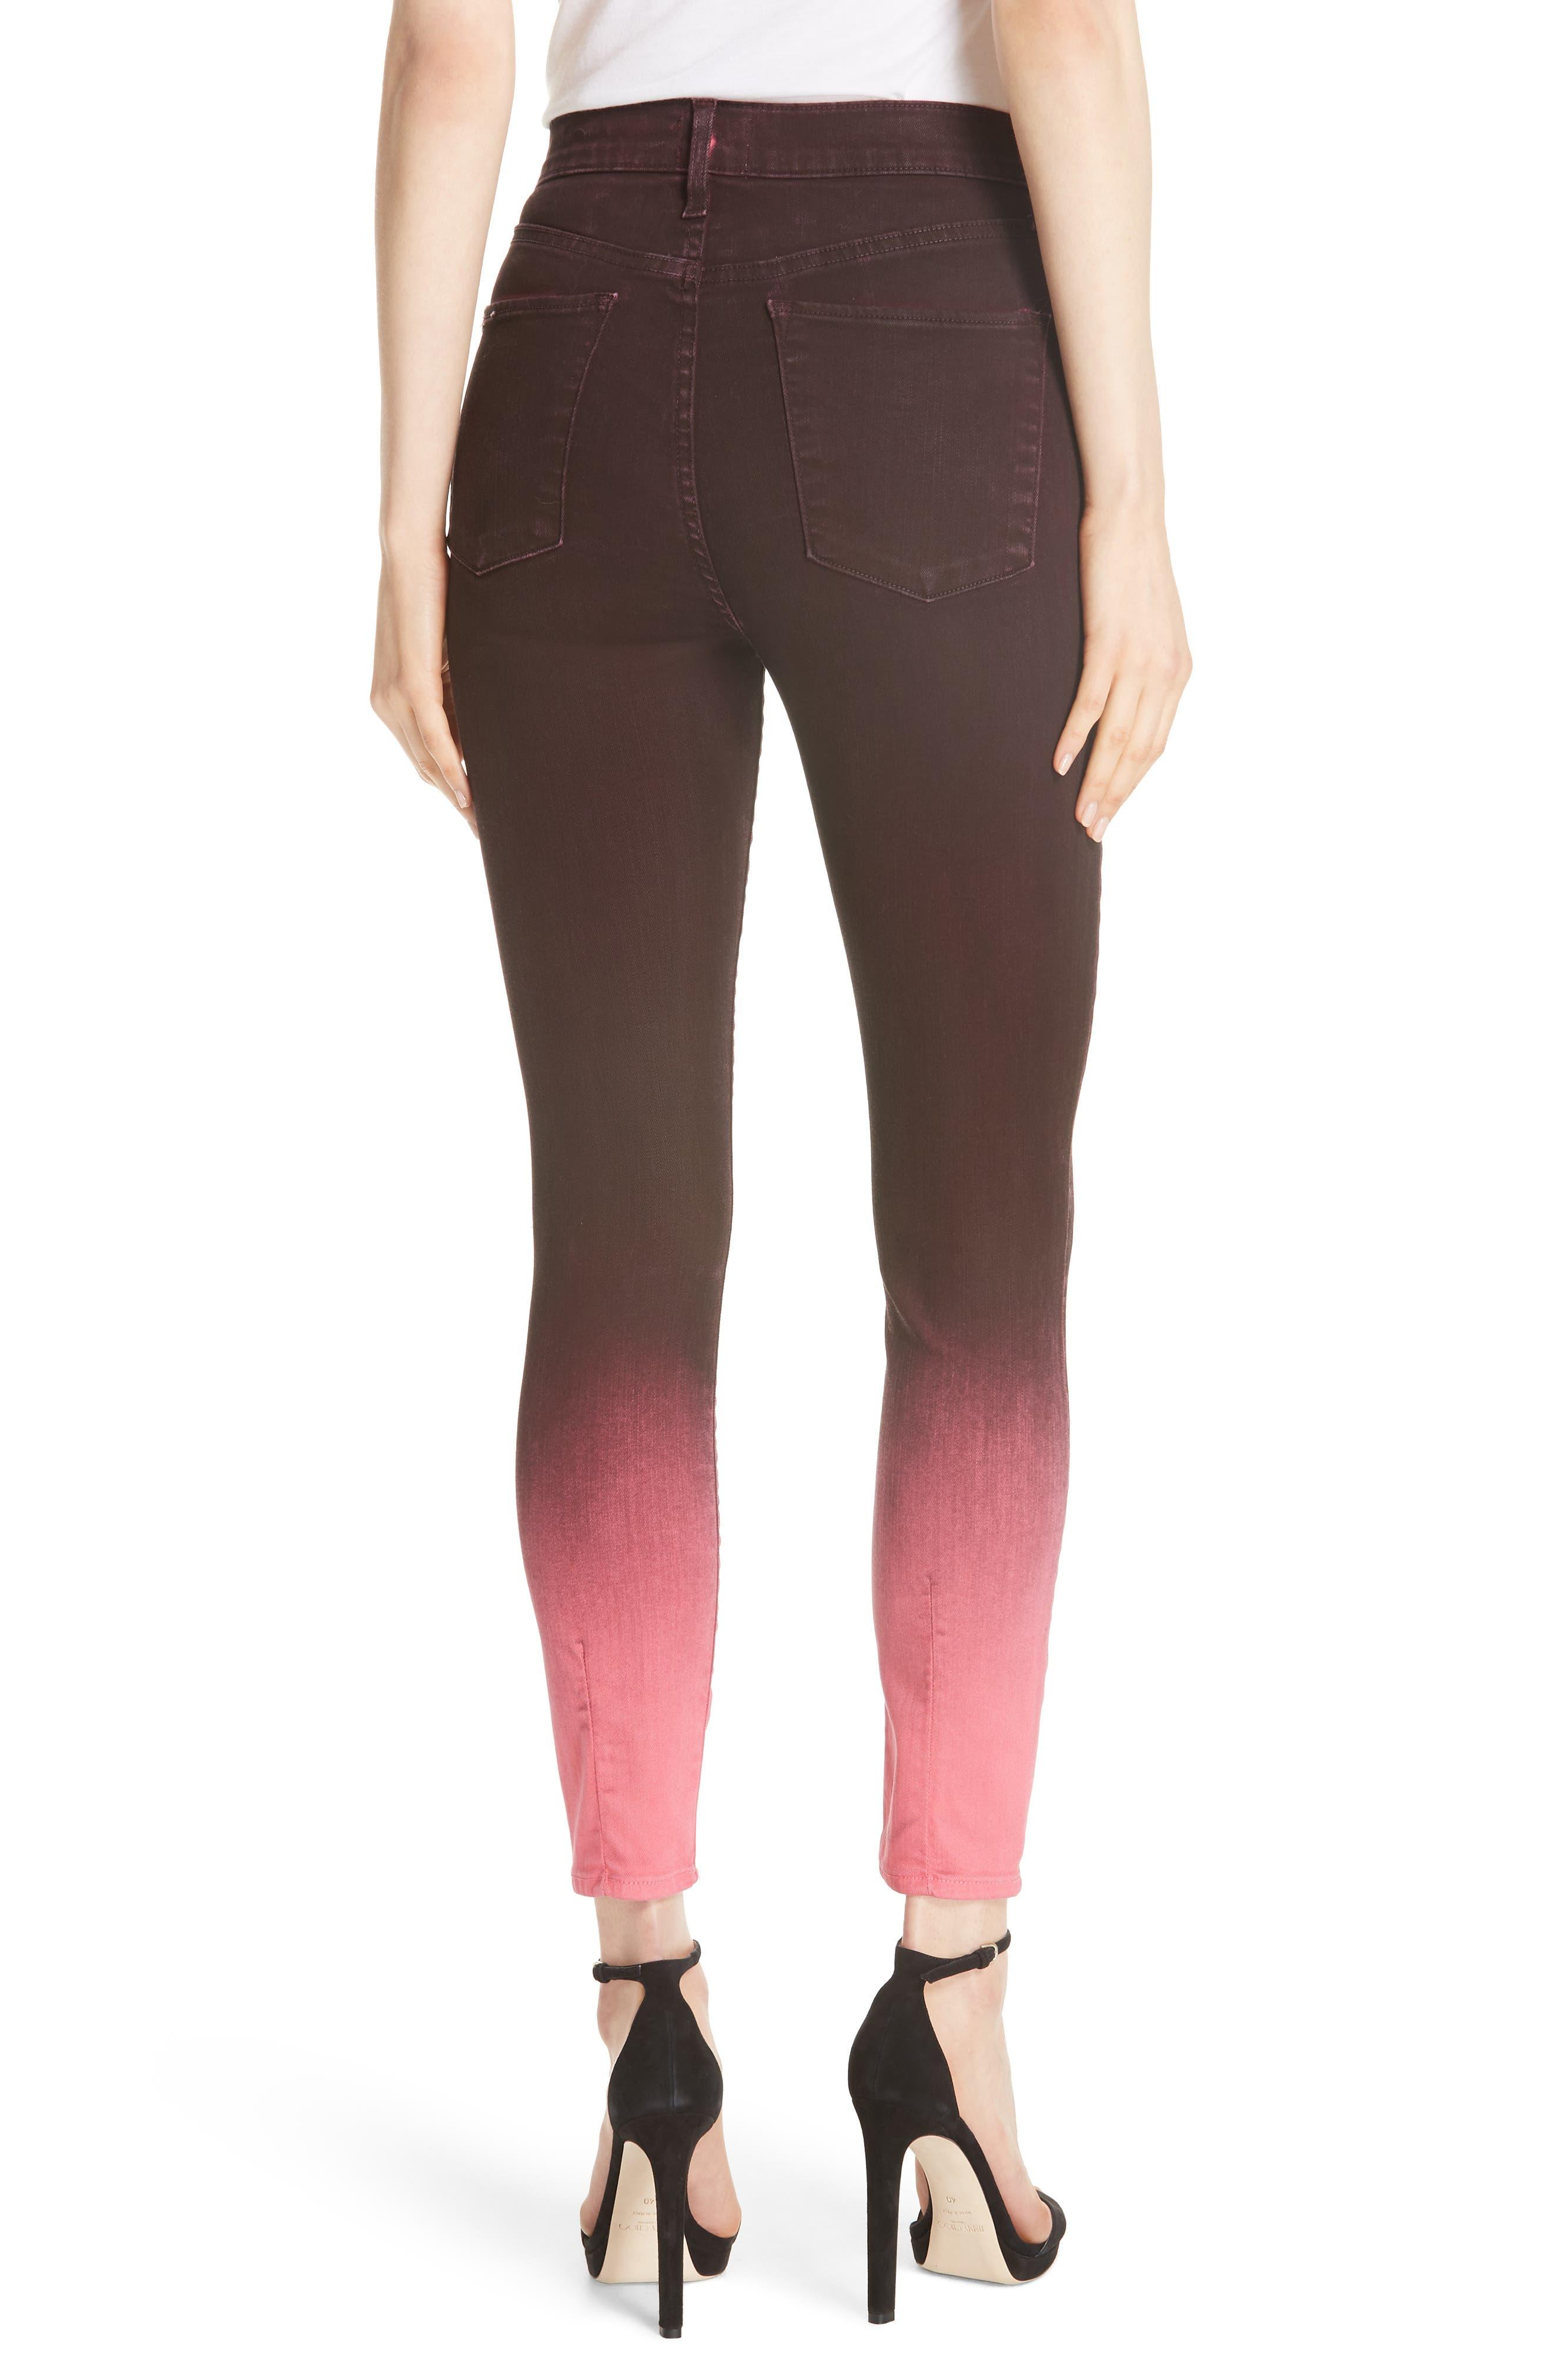 AO.LA Good High Waist Ankle Skinny Jeans,                             Alternate thumbnail 2, color,                             WINE/ BUBBLEGUM